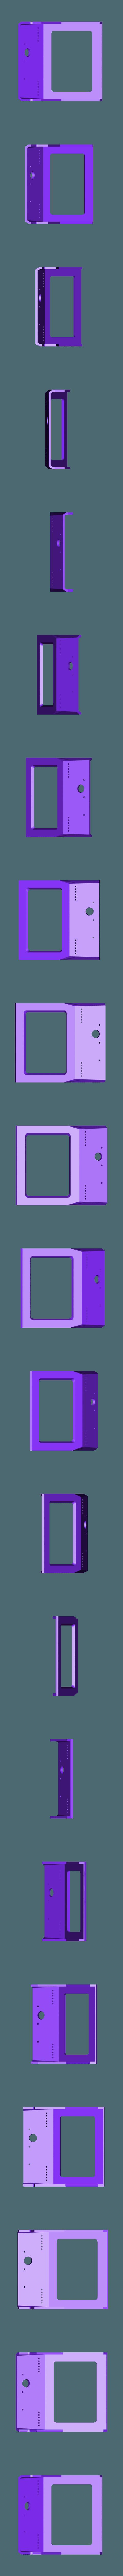 part_4.stl Download free STL file game machine • 3D printing design, kimjh